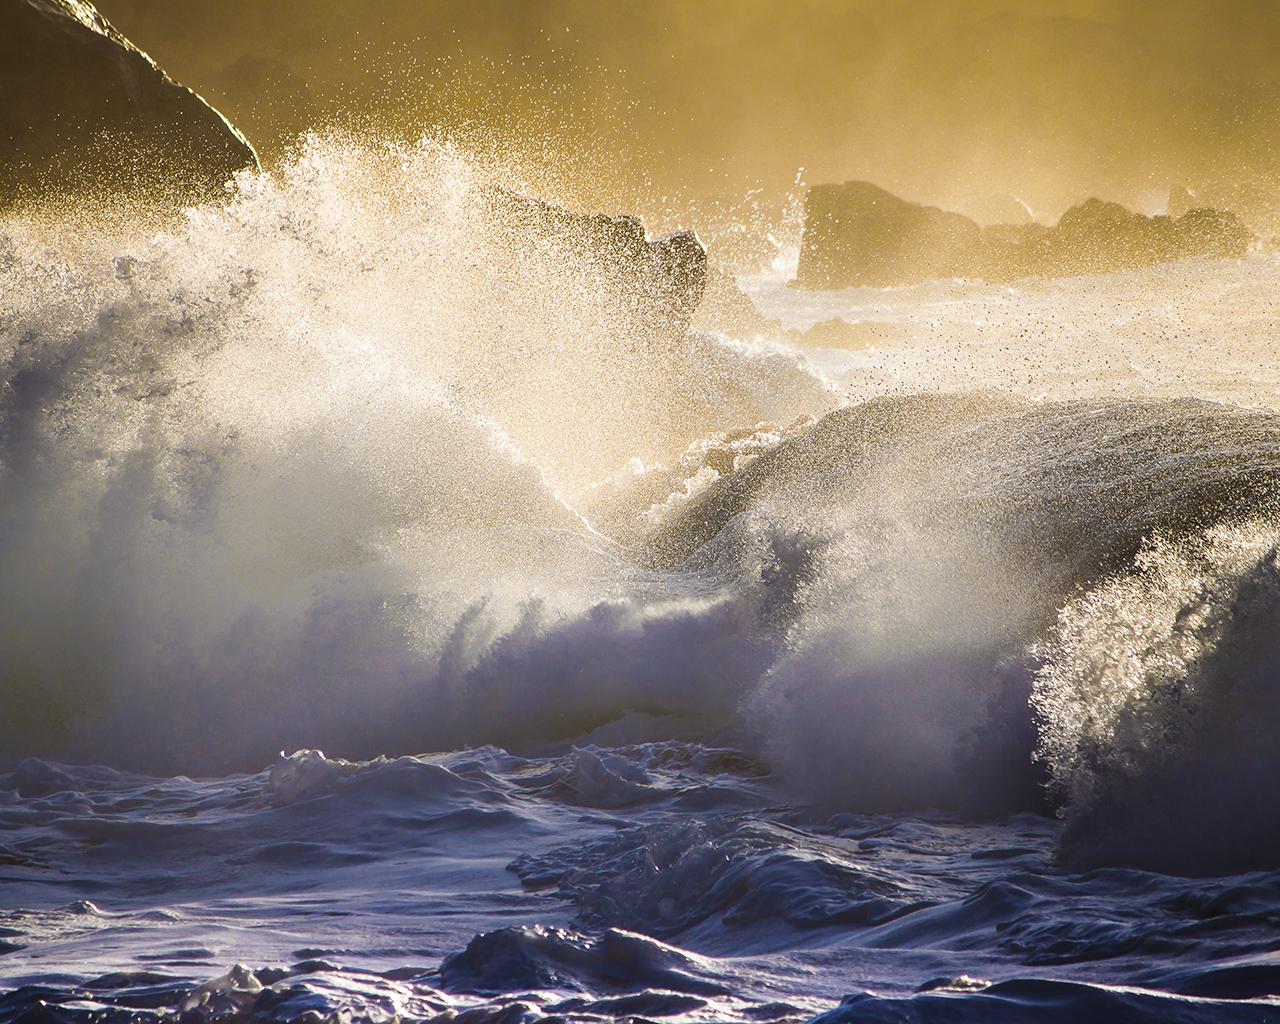 Cute Cartoon Food Wallpapers Large Waves Hit The Rocks Water Wallpaper